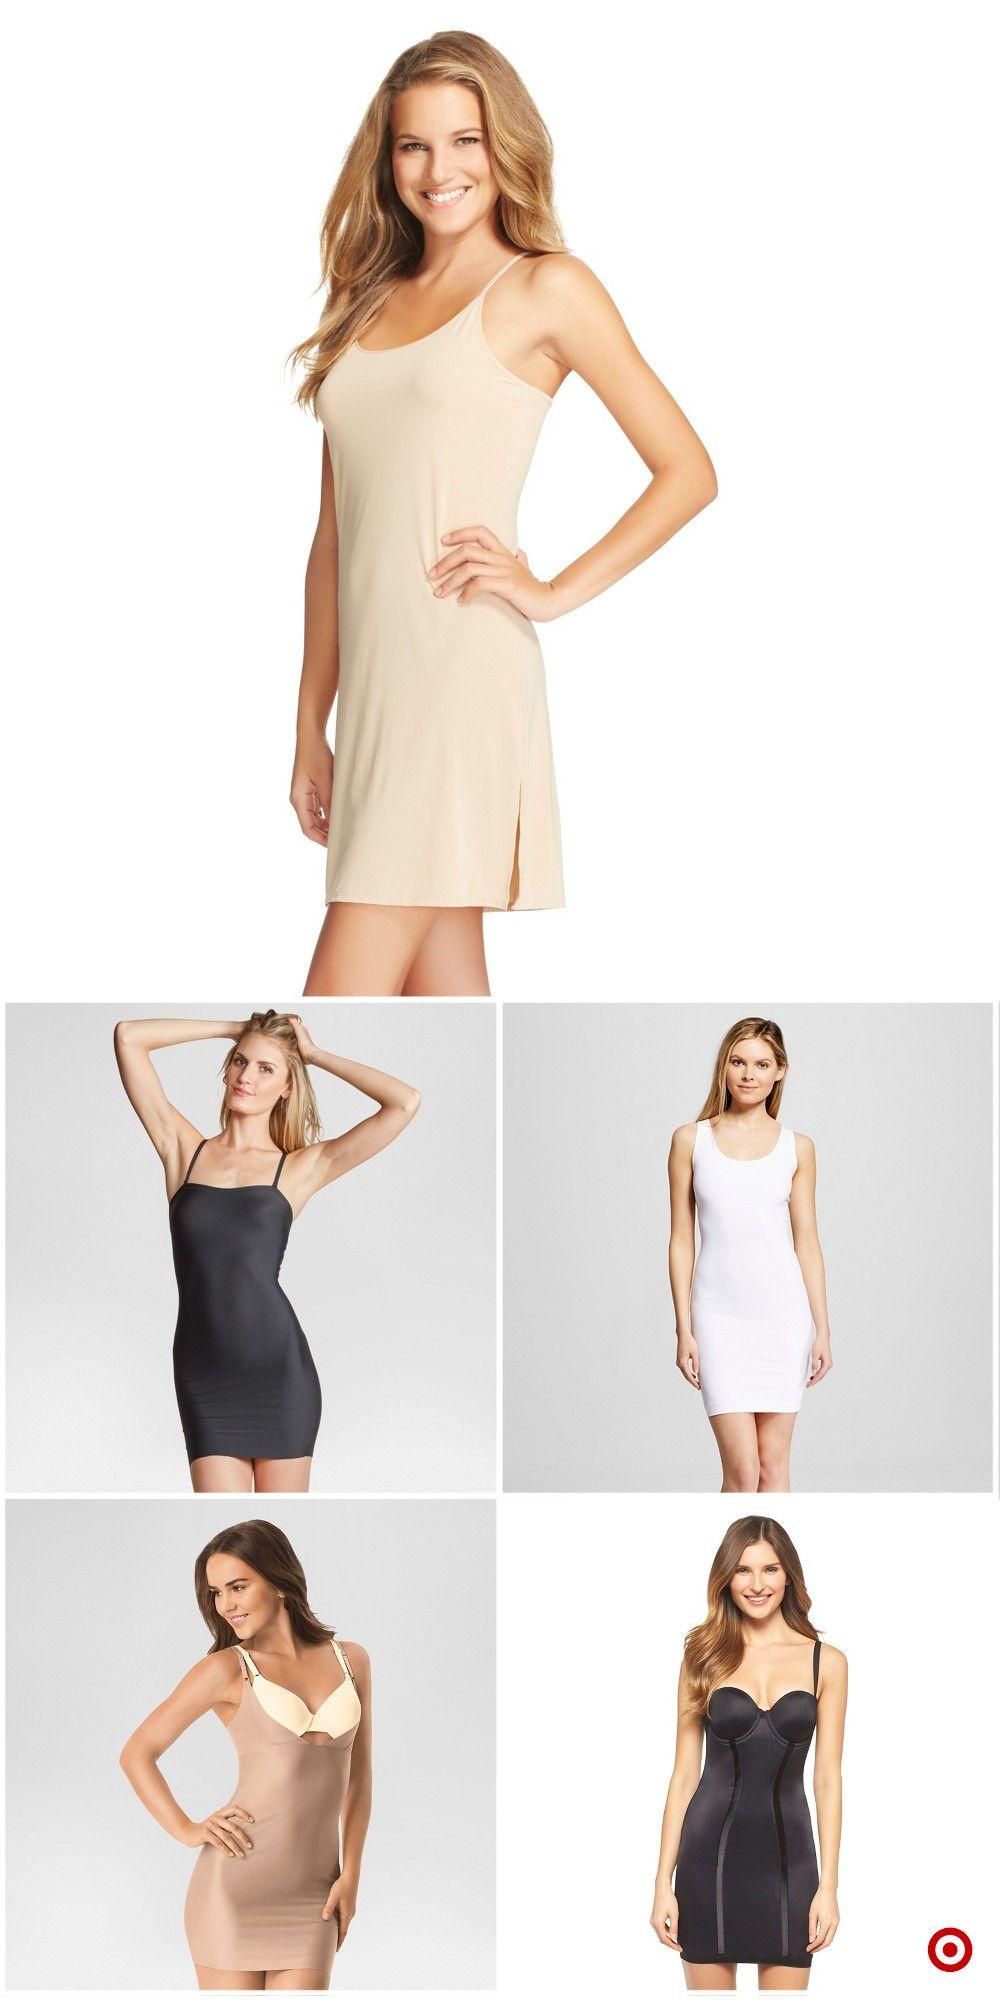 Odering Target Bridesmaid Dresses